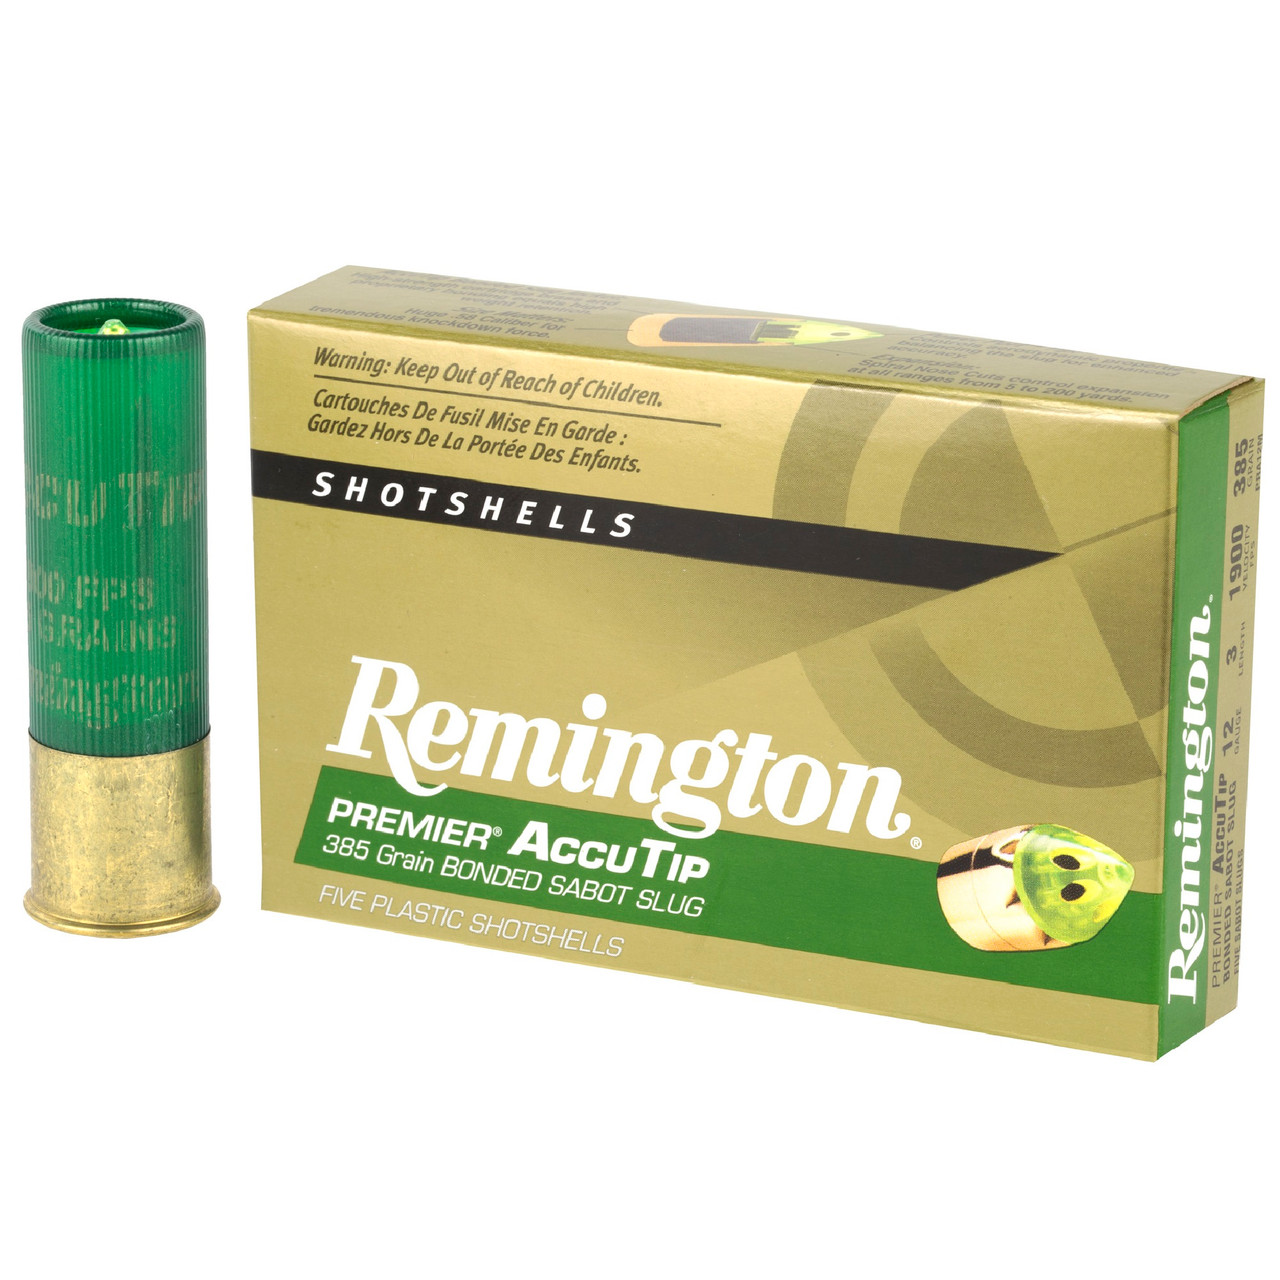 Remington Premier 12ga 3 385gr Accutip Bonded Sabot Slug With Power Port Tip 5 Box Munitions Express